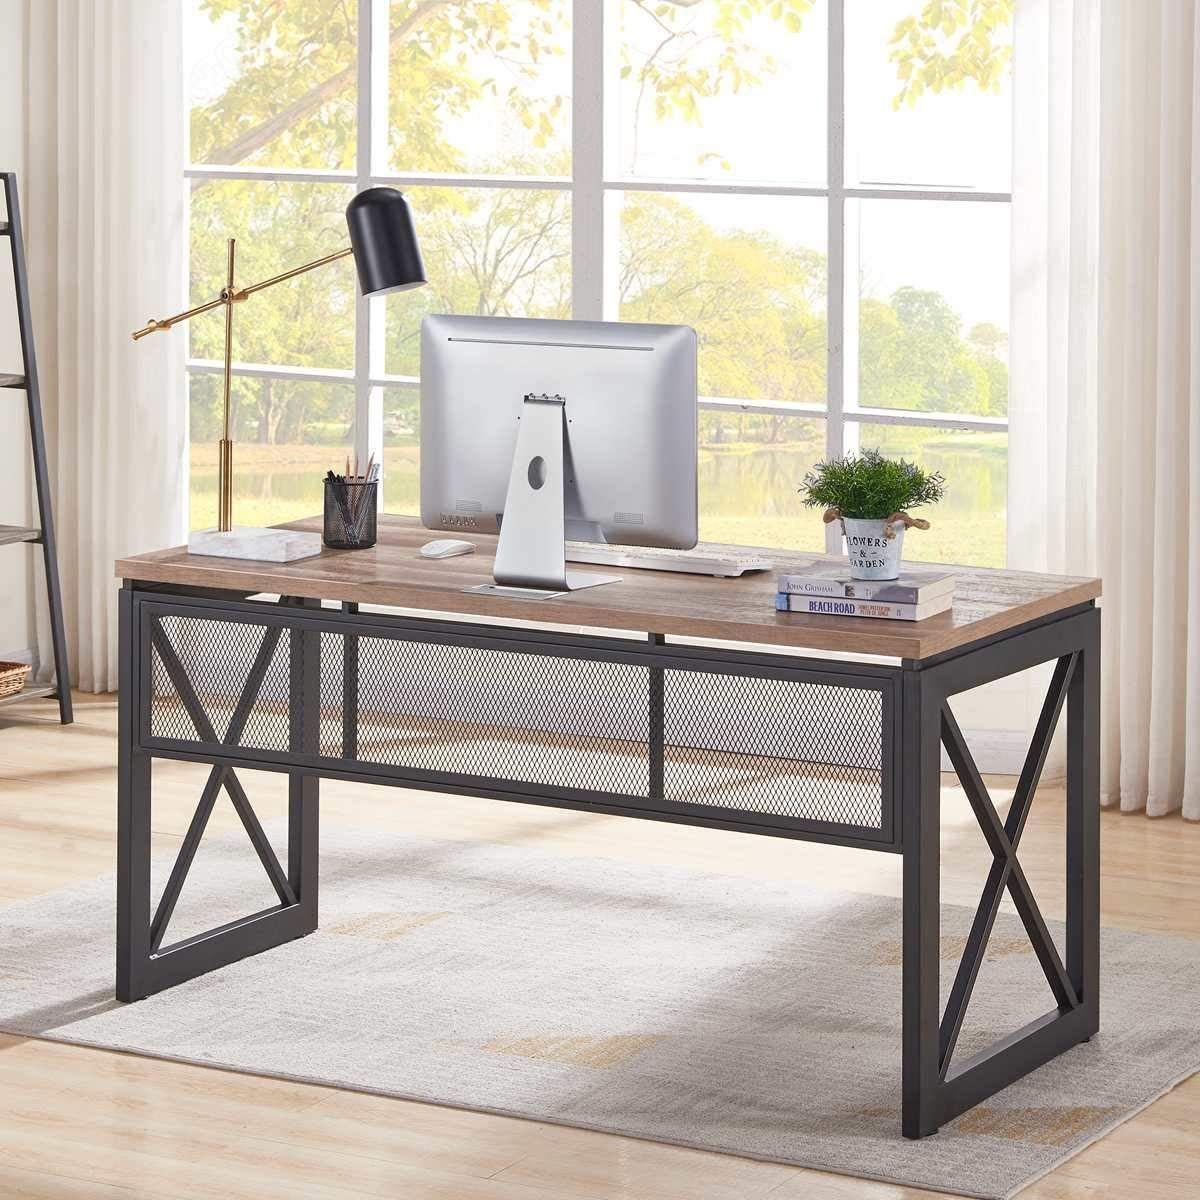 Farmhouse desks rustic desks farmhouse goals in 2020